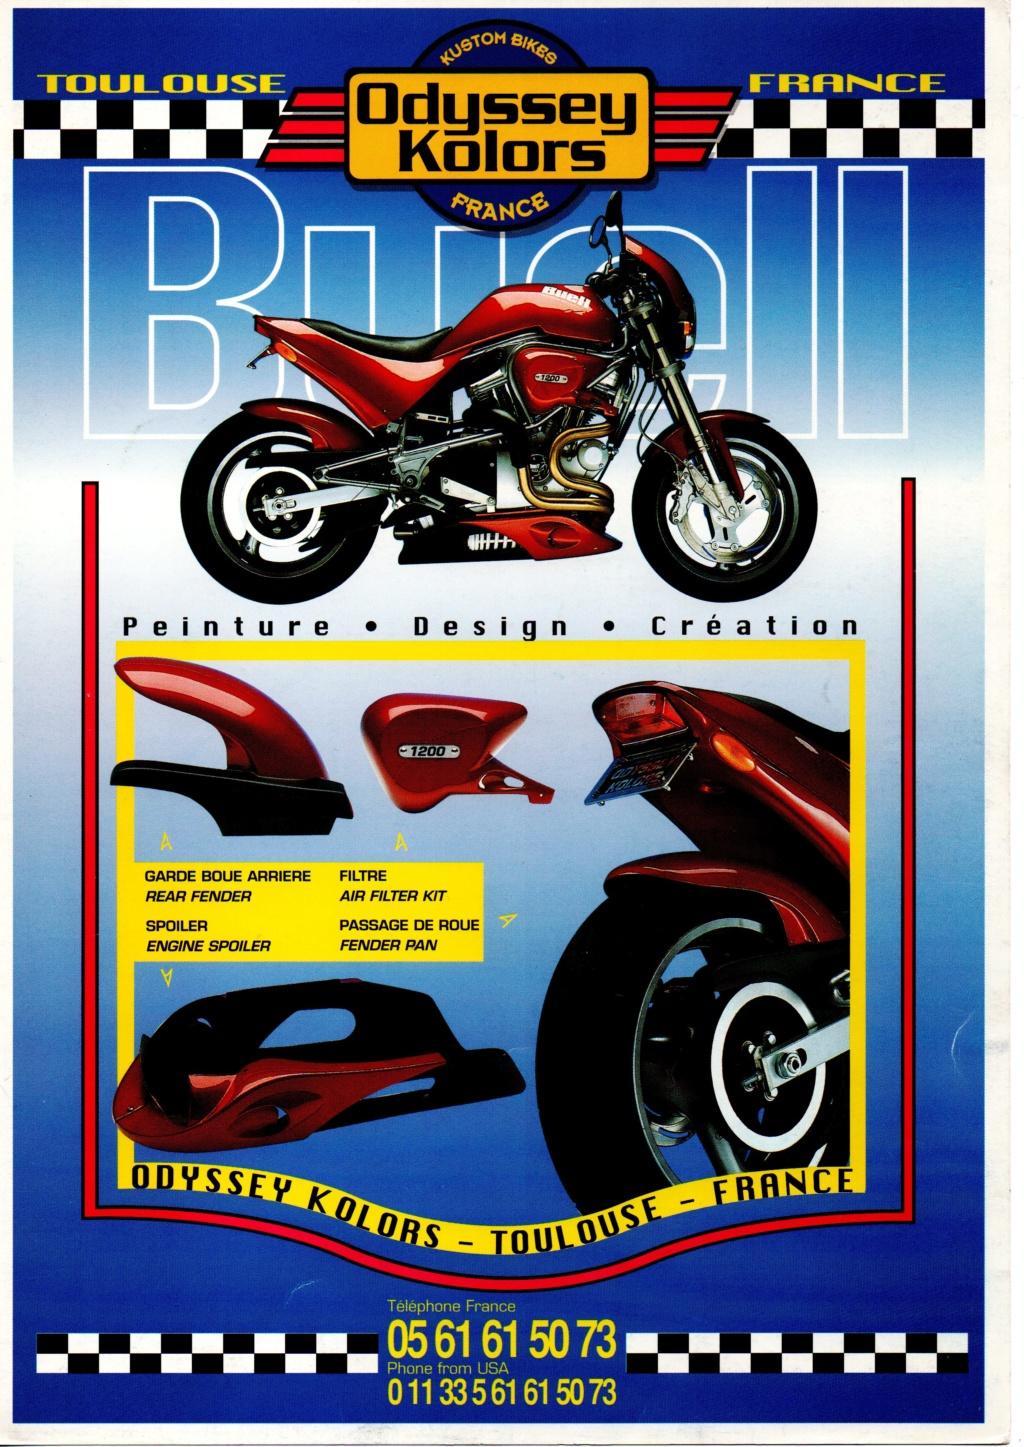 Buell S1 Lightning 97 Odyssey Kolors : l'histoire Scan2013